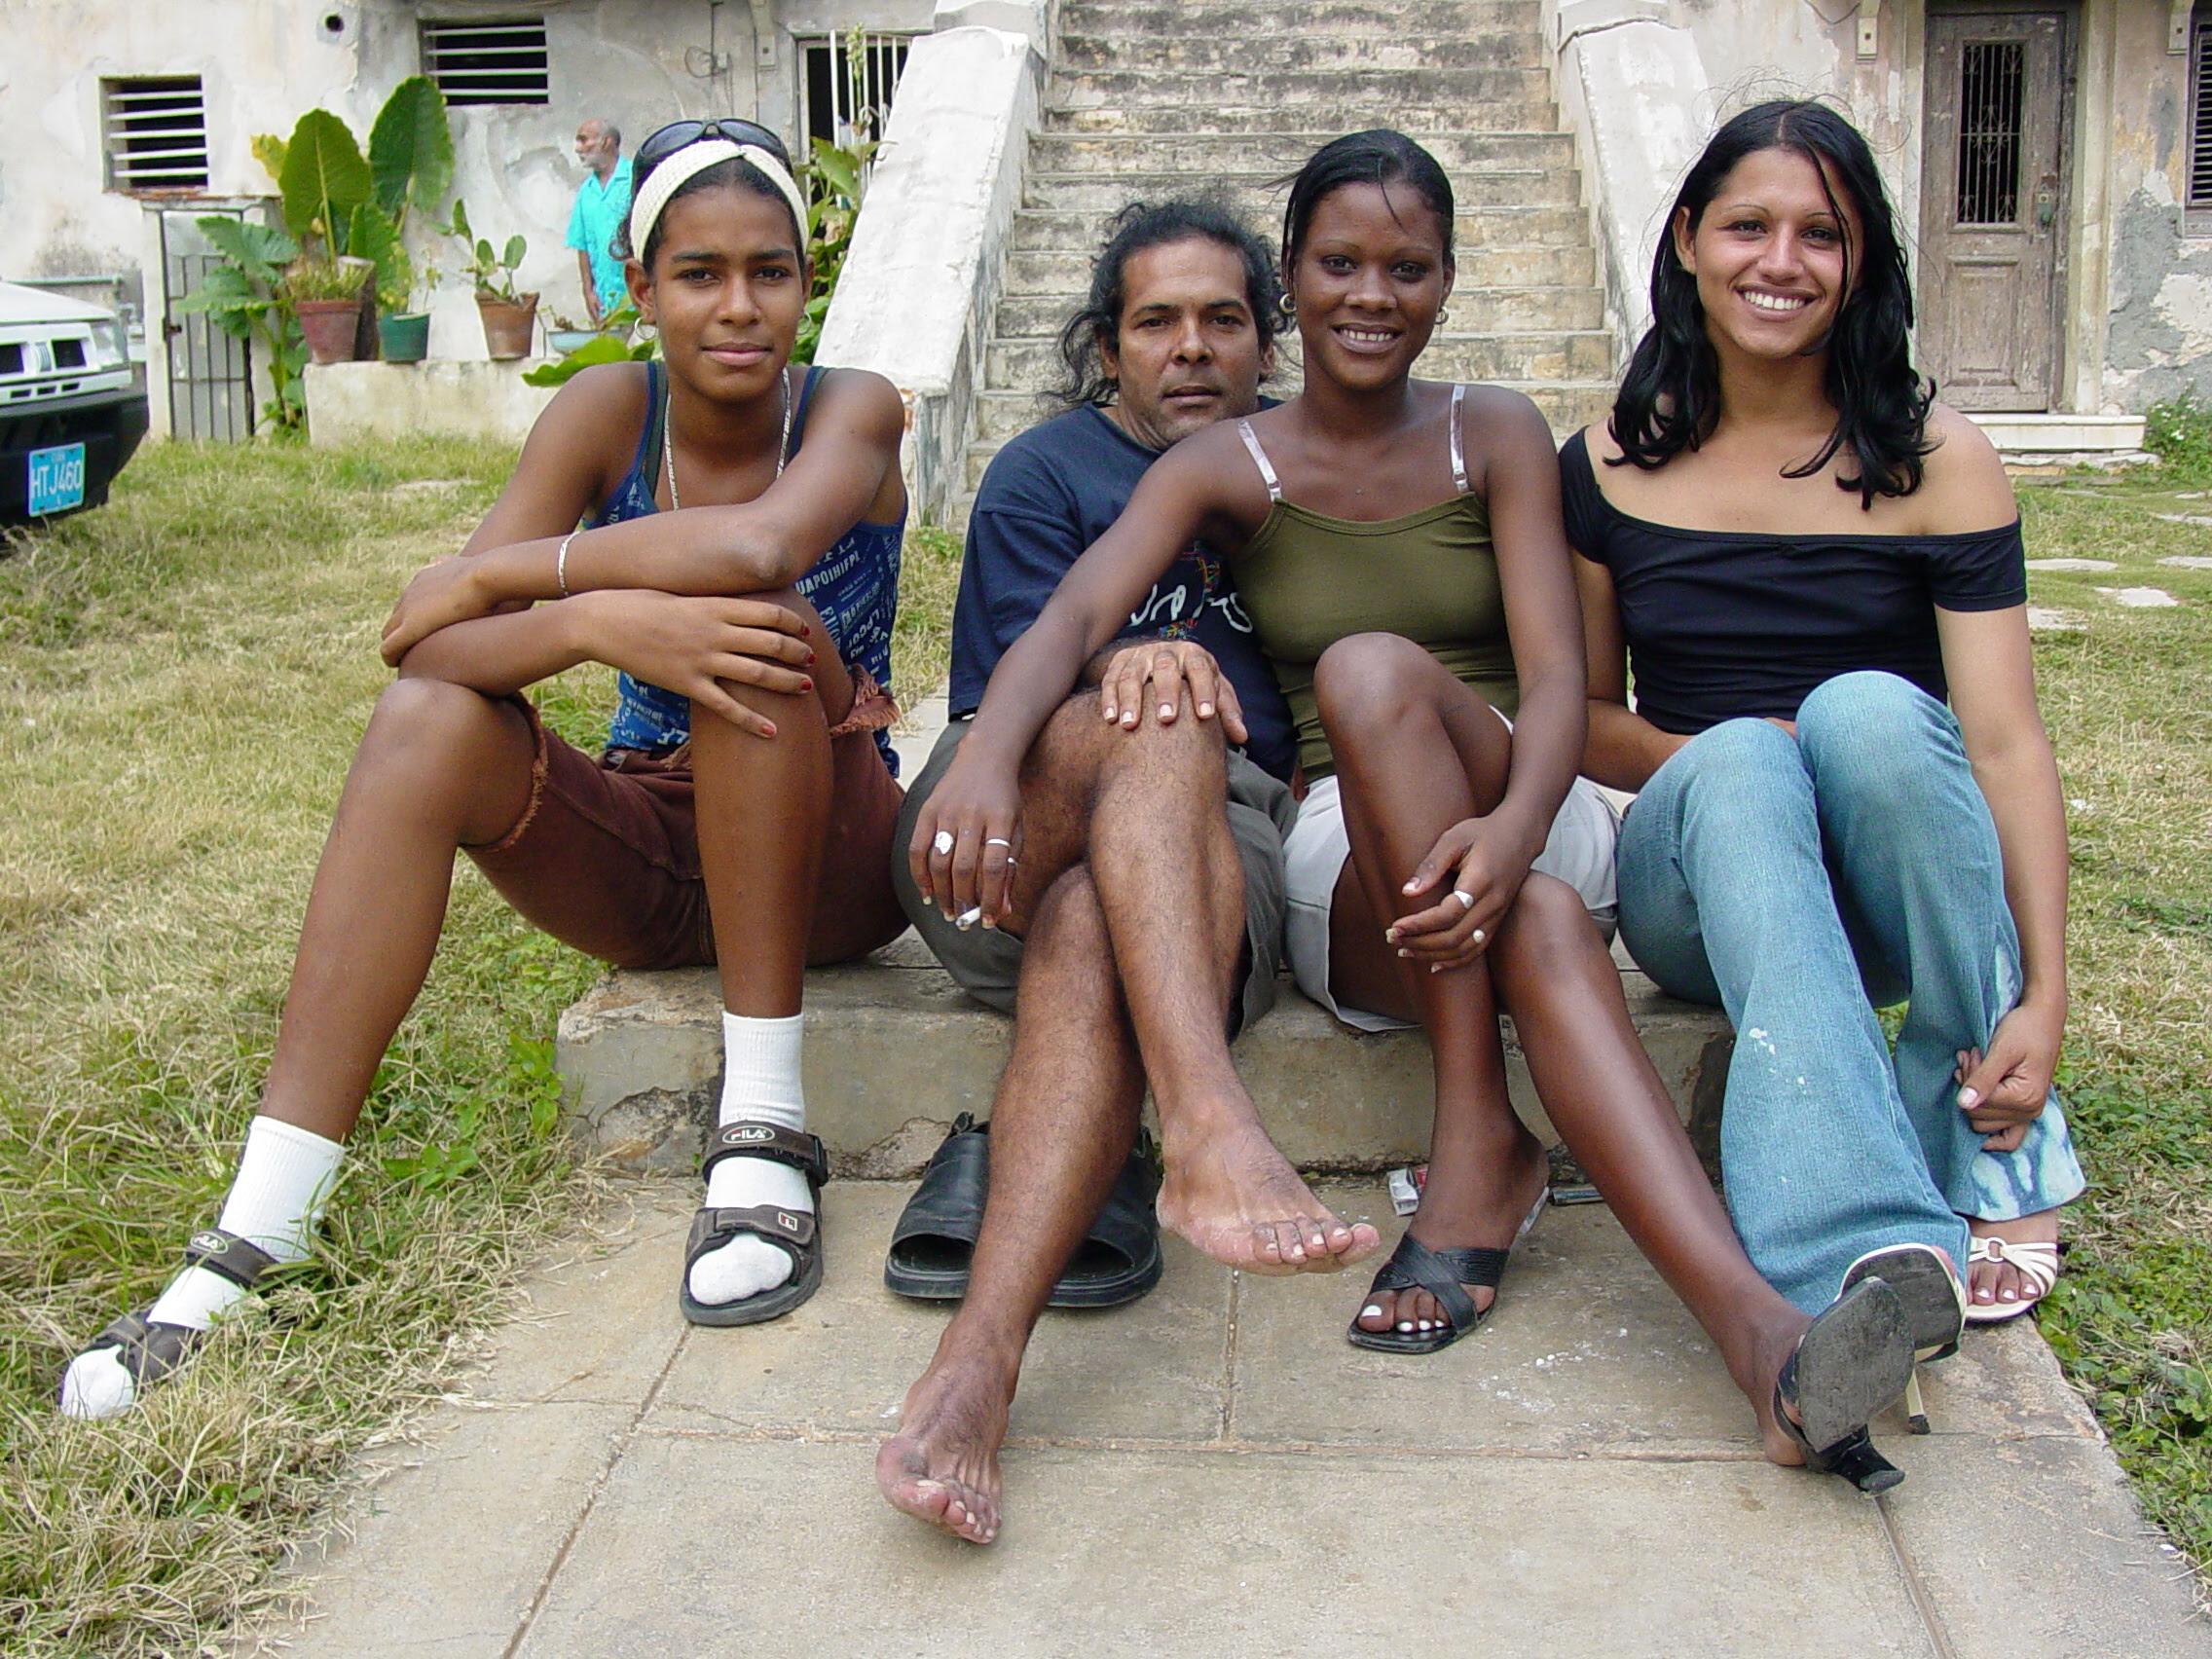 Cuban teen girls make facial home